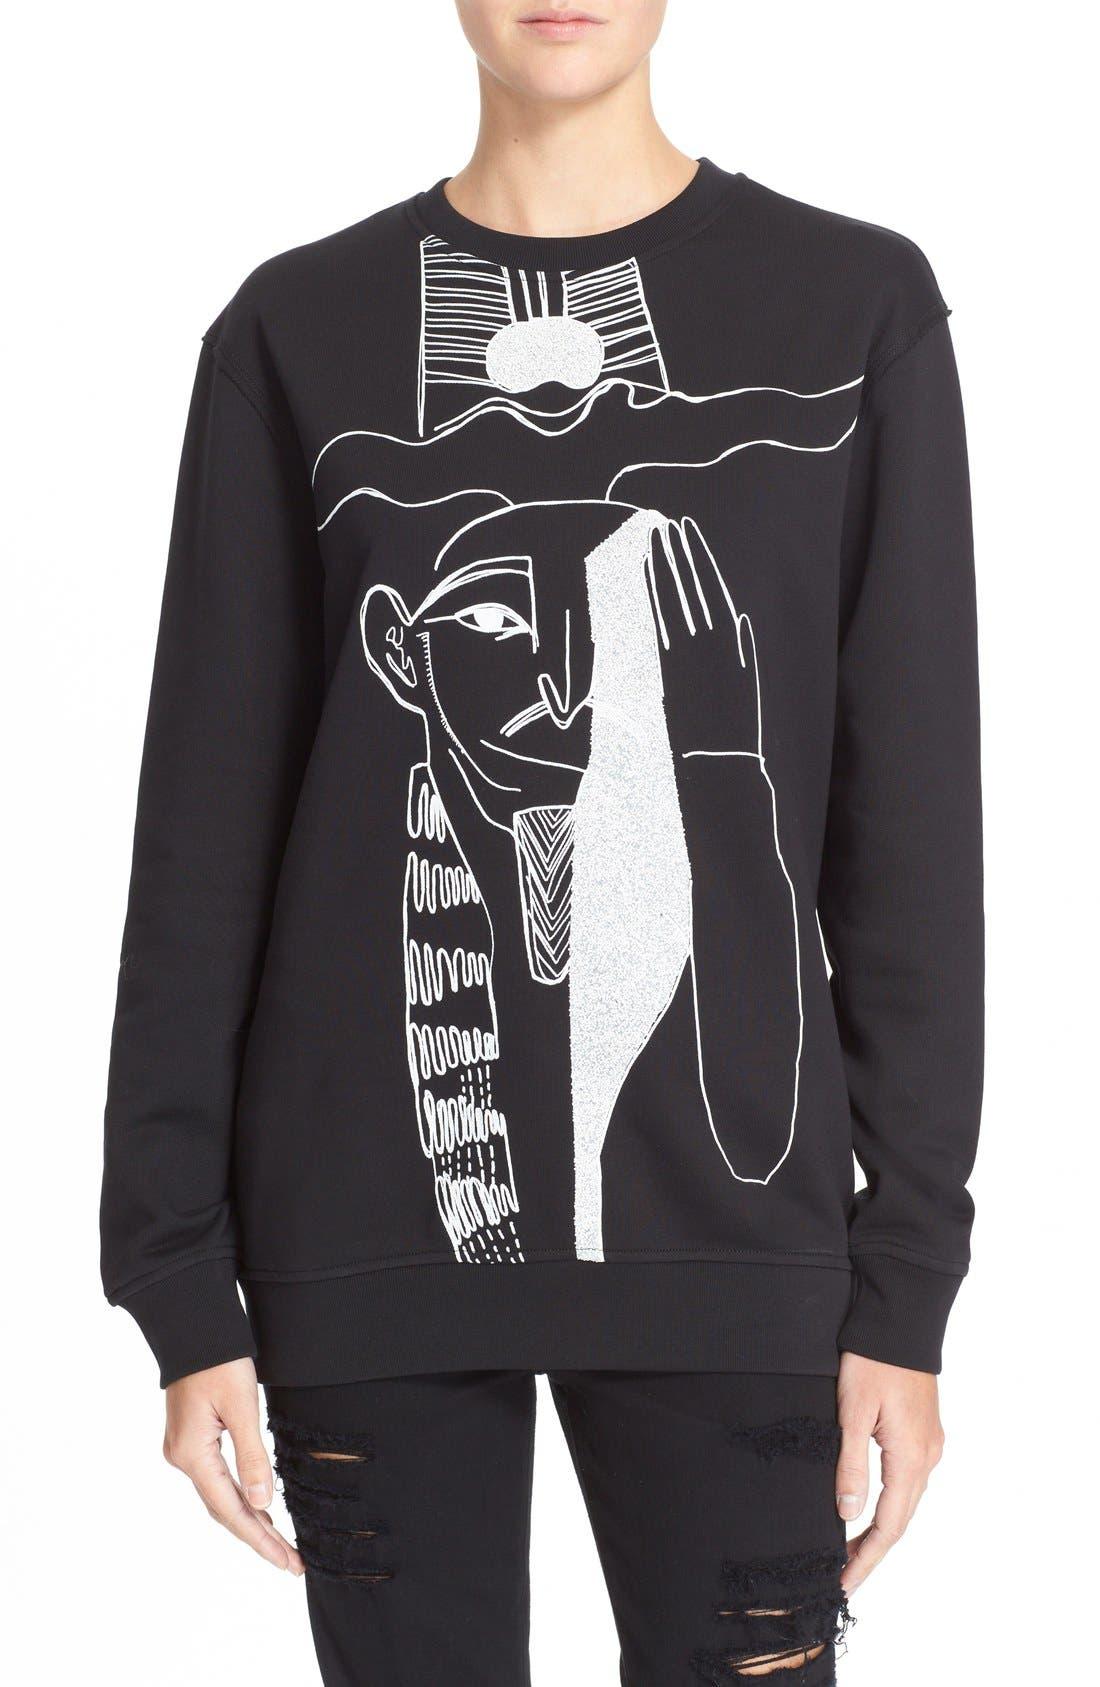 Alternate Image 1 Selected - McQ by Alexander McQueen Oversized Graphic Sweatshirt